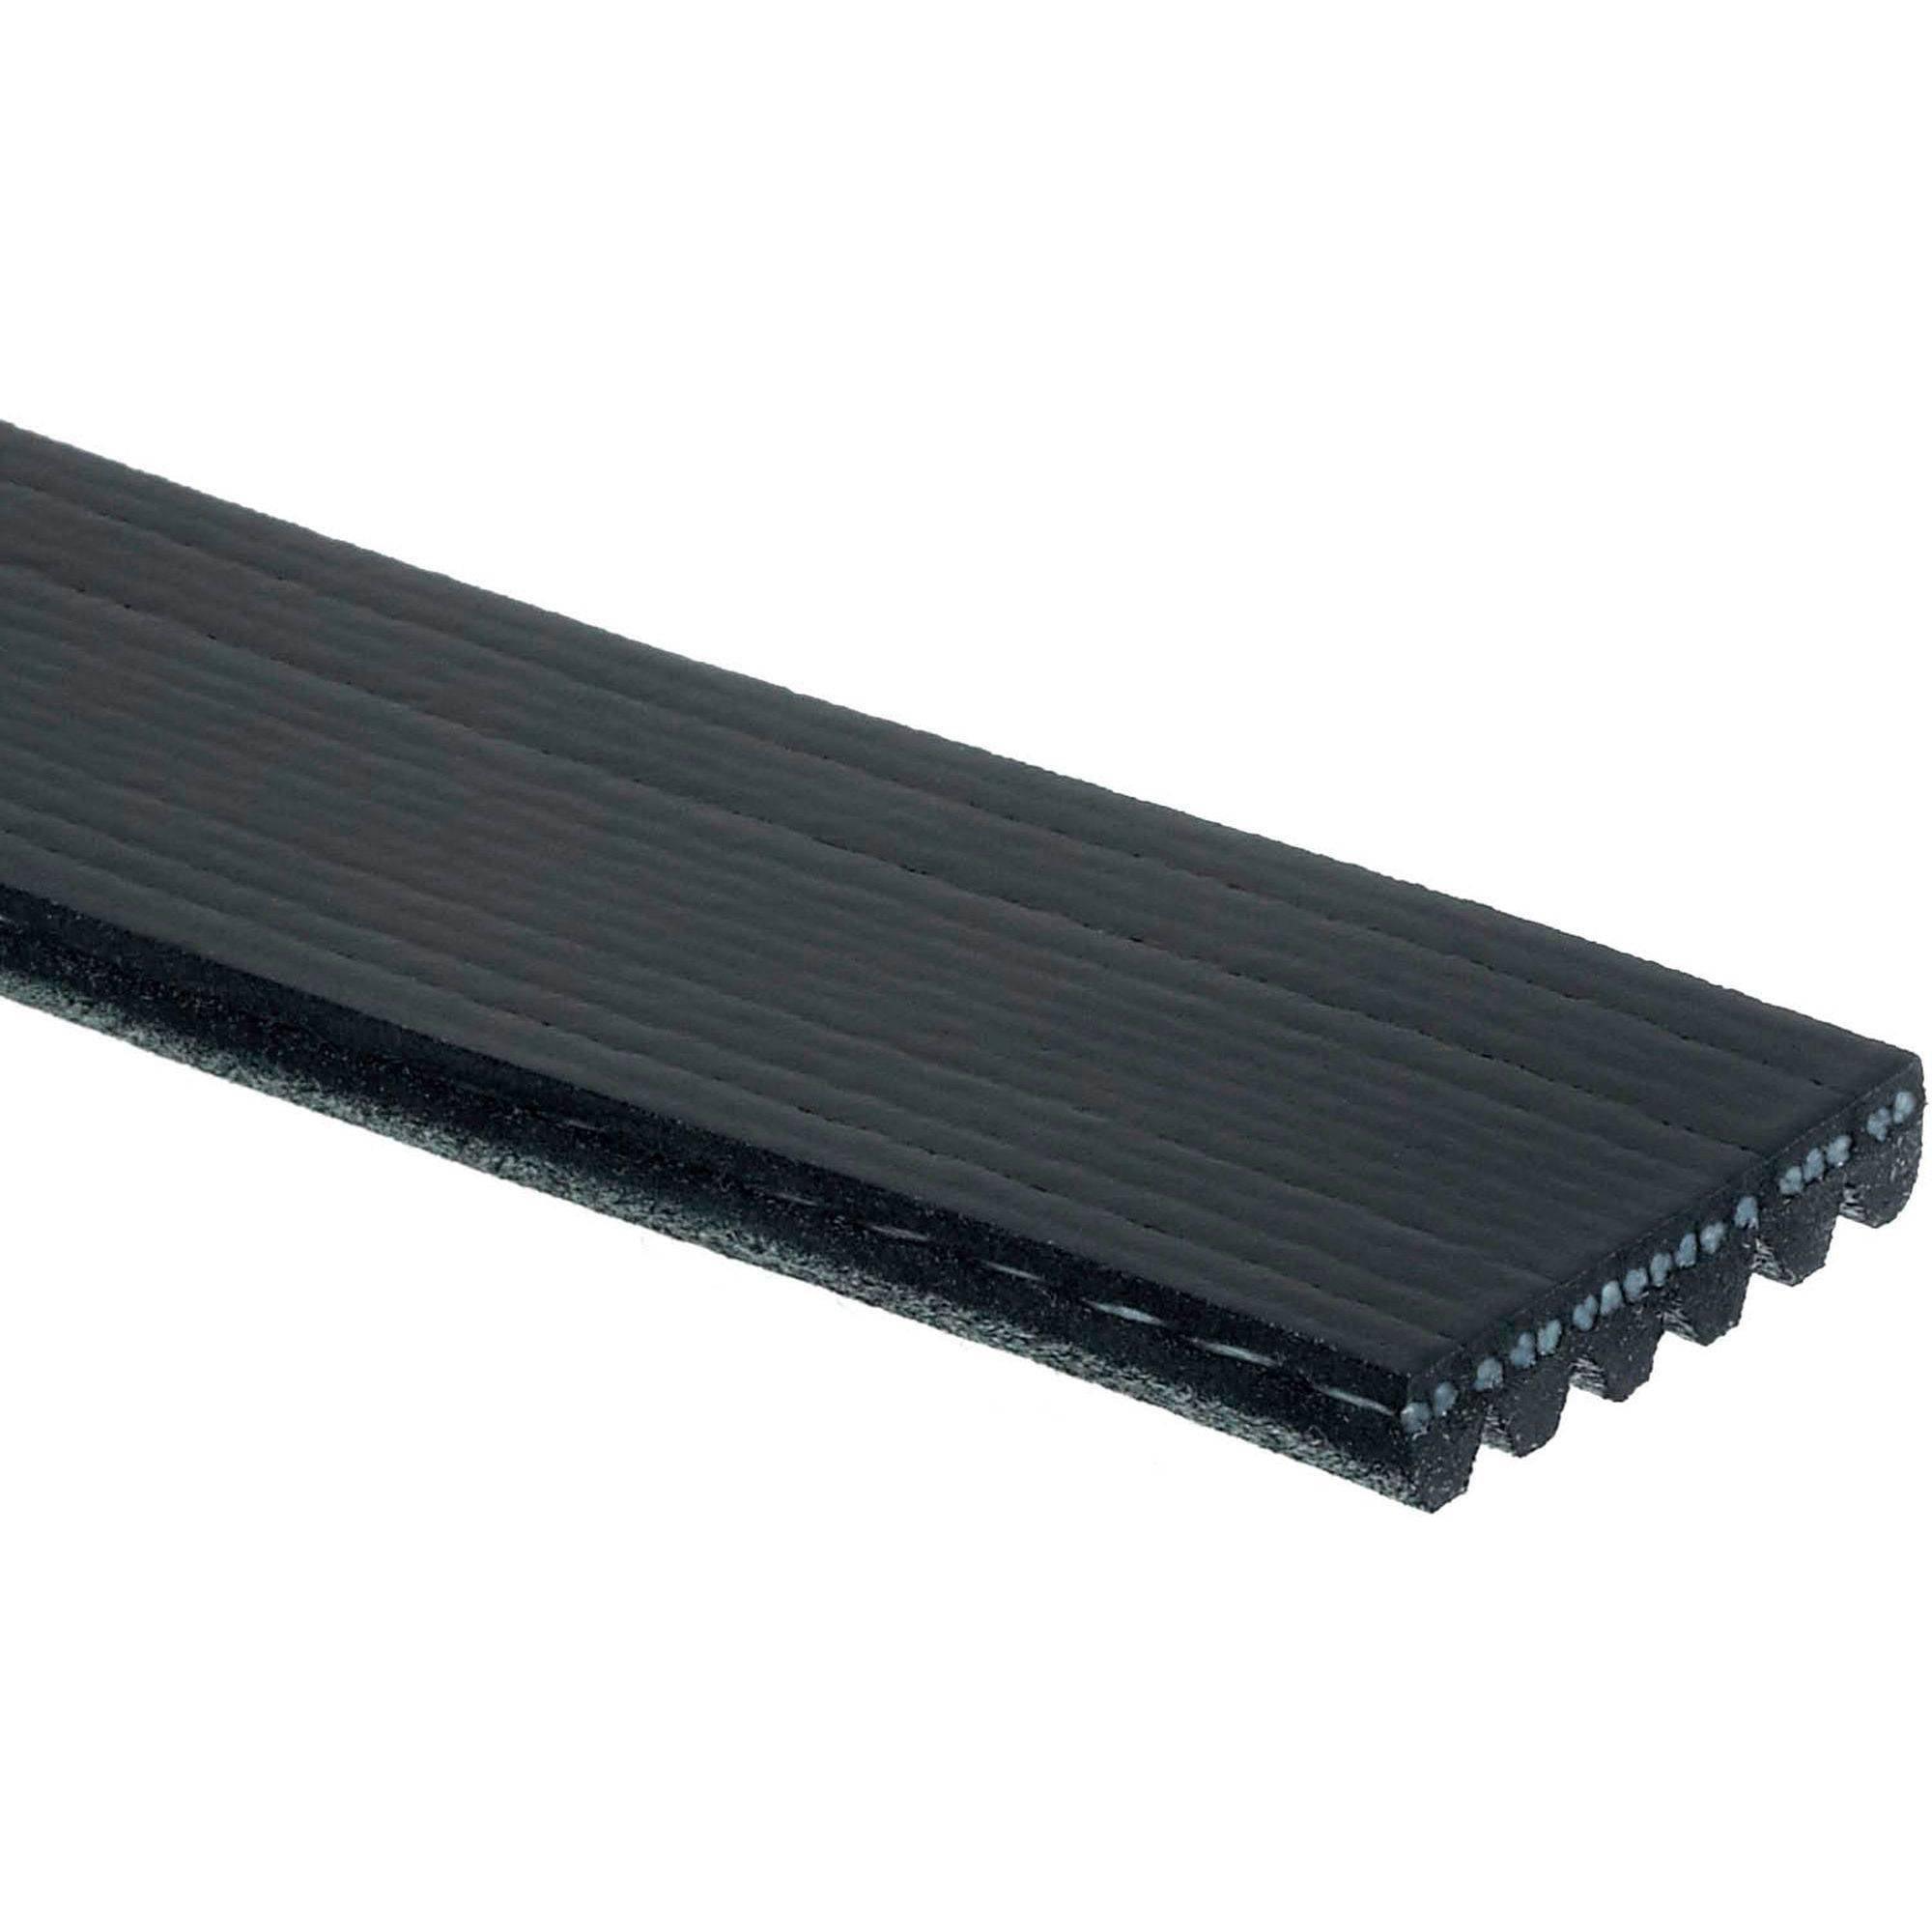 ACDelco 6K1000 V-Ribbed Belt